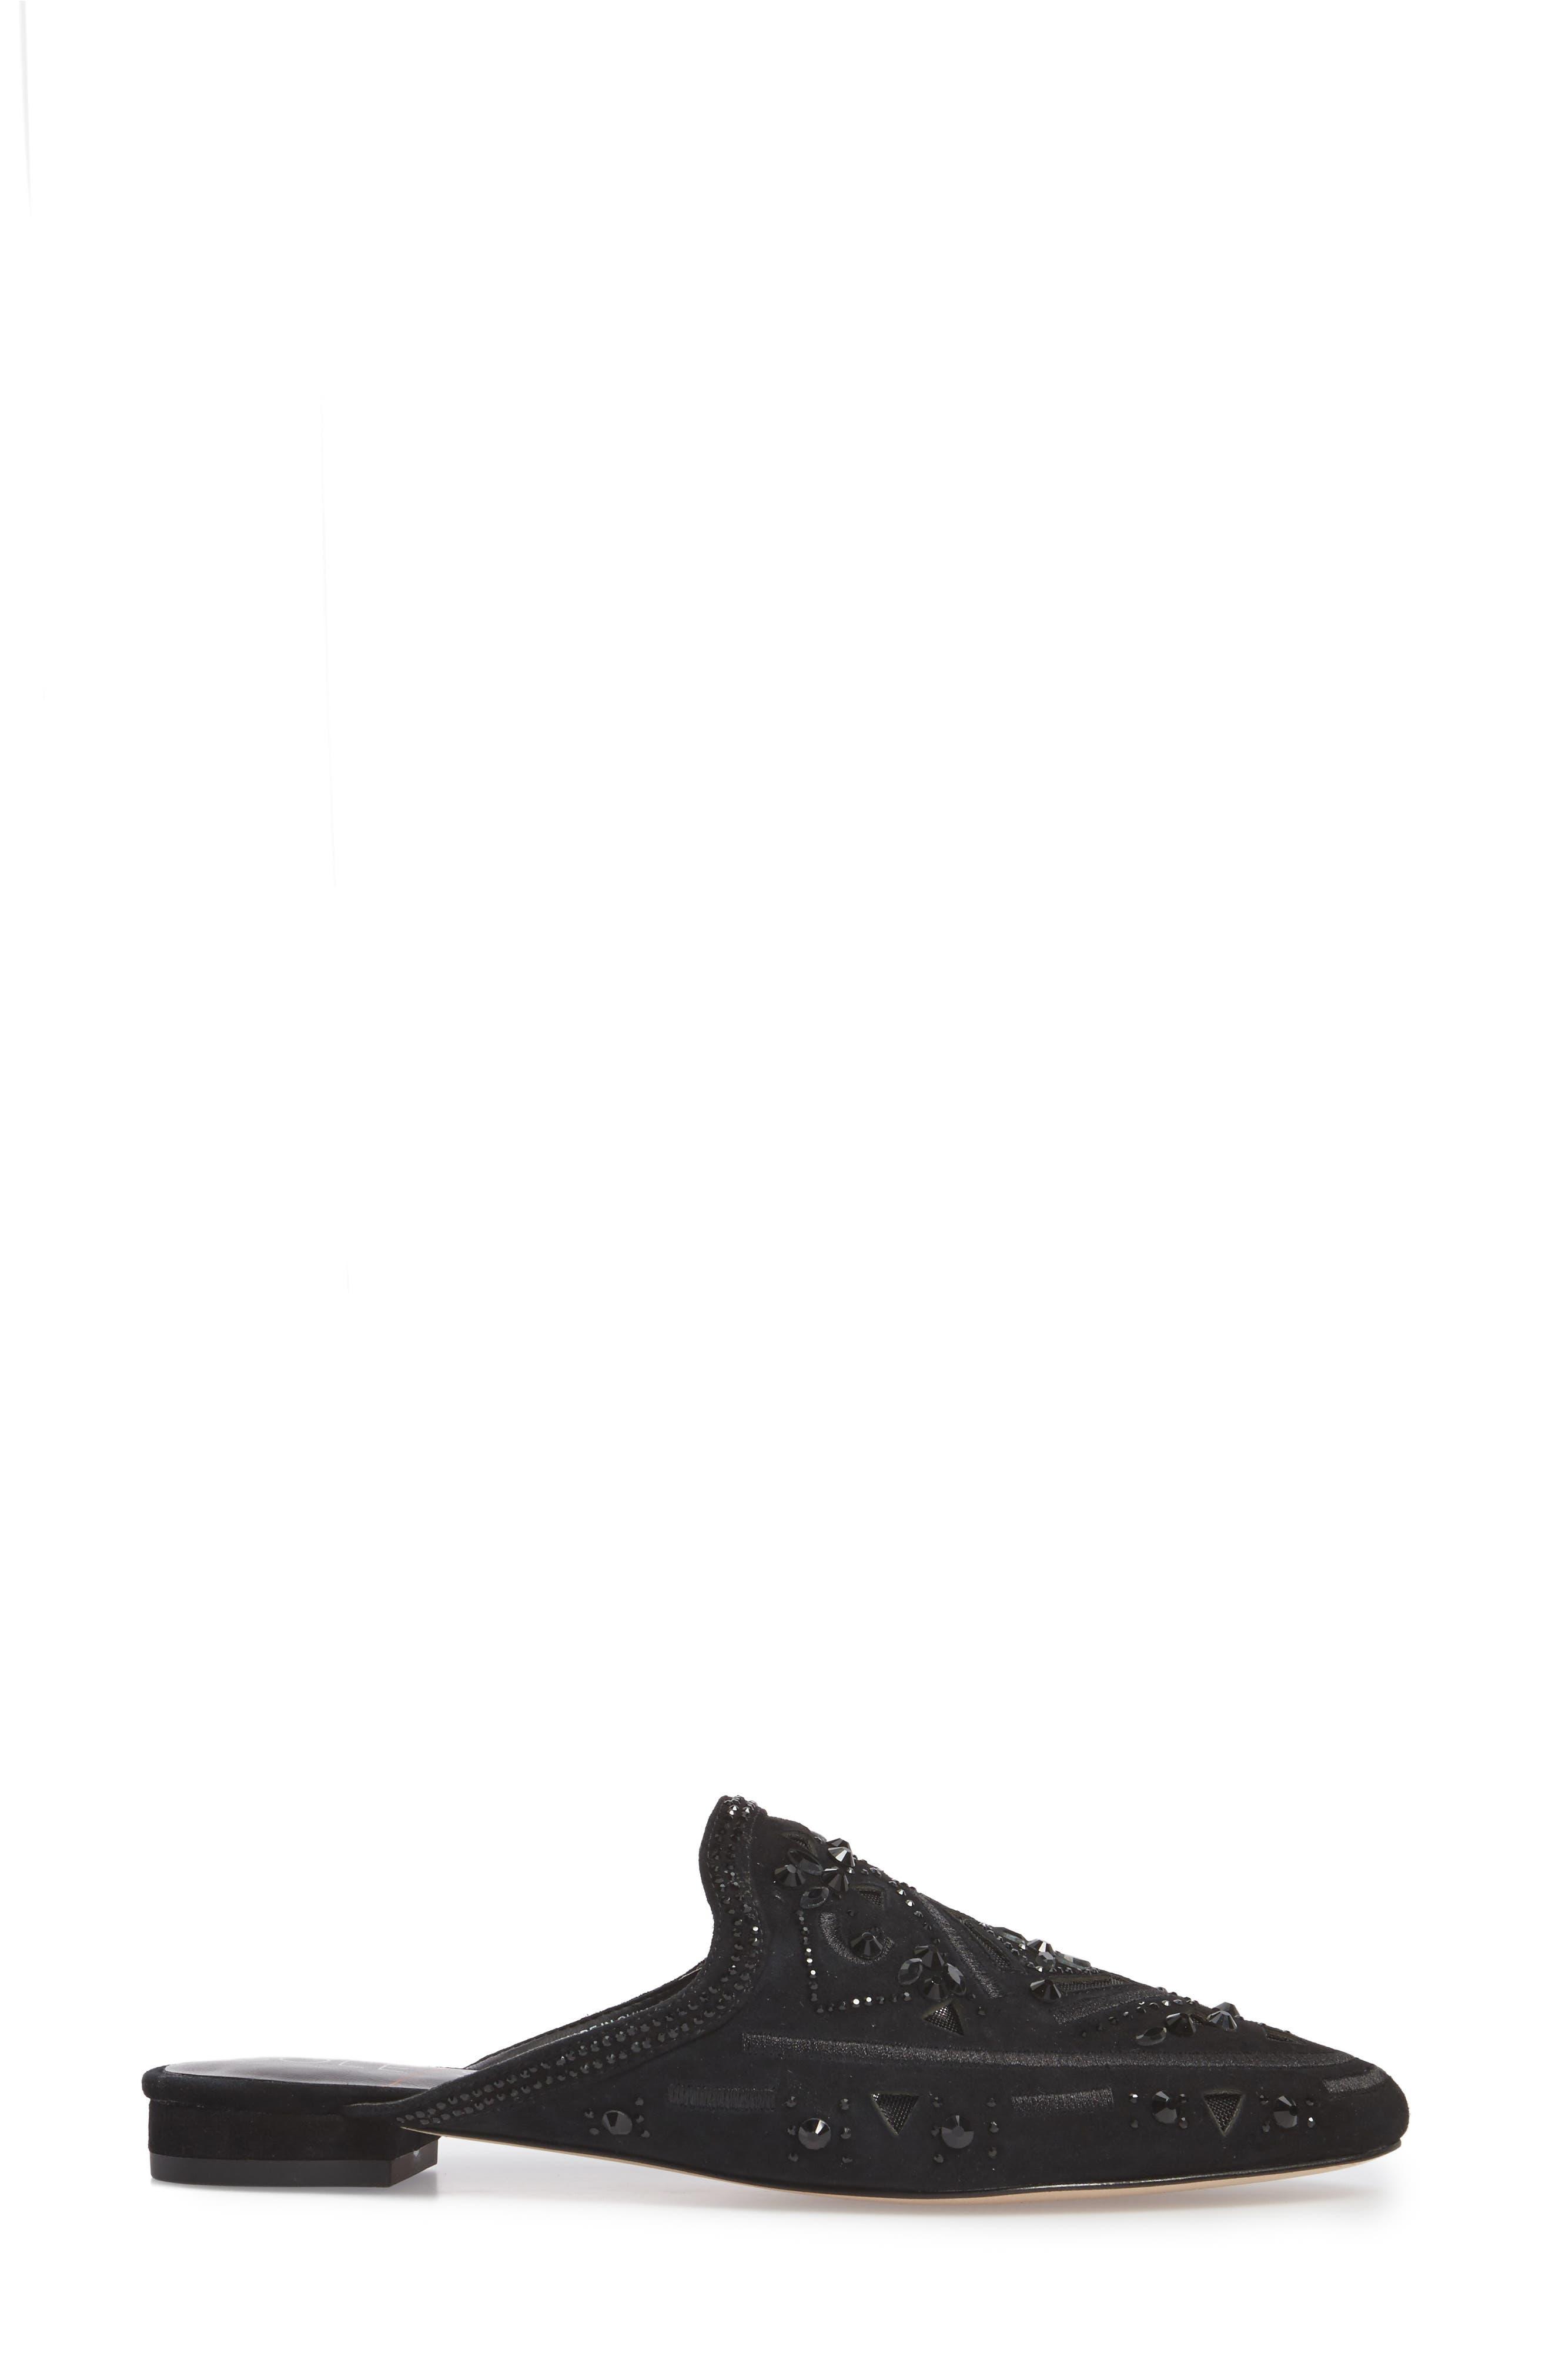 Alternate Image 3  - Sole Society Peace Embellished Loafer Mule (Women)